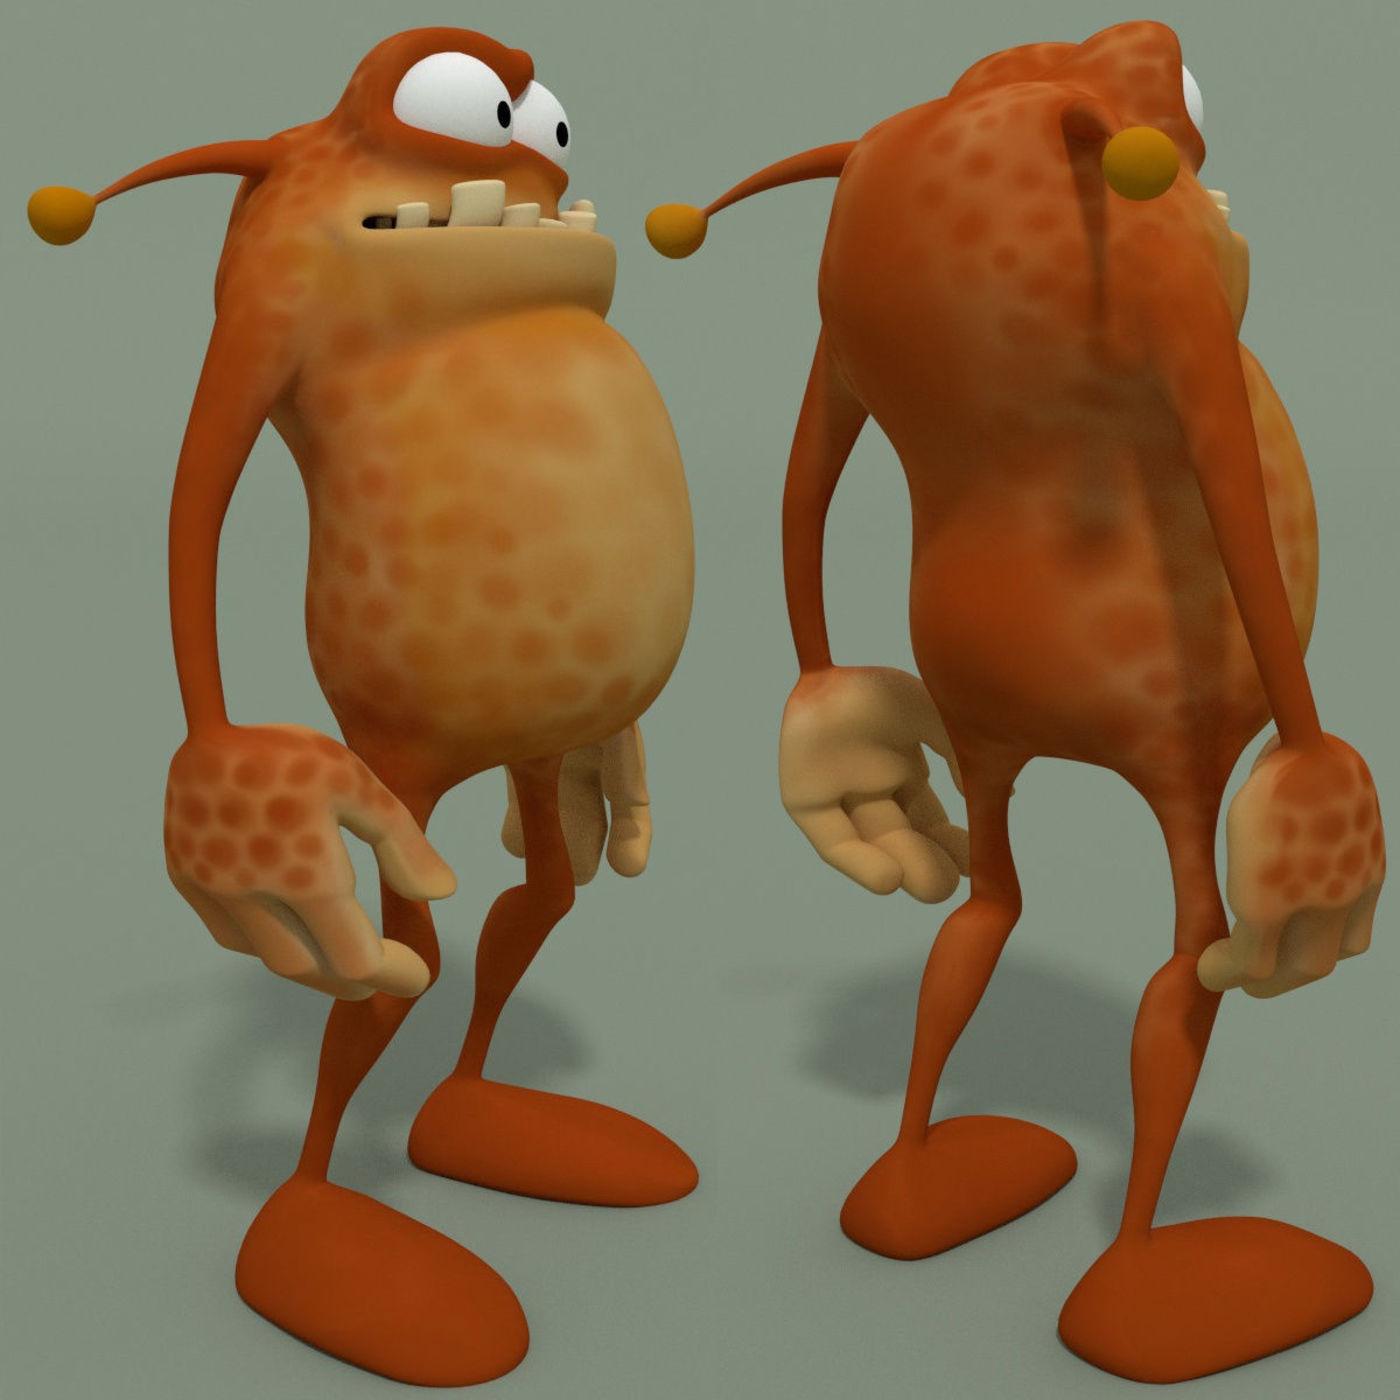 Animated Cartoon Monster A